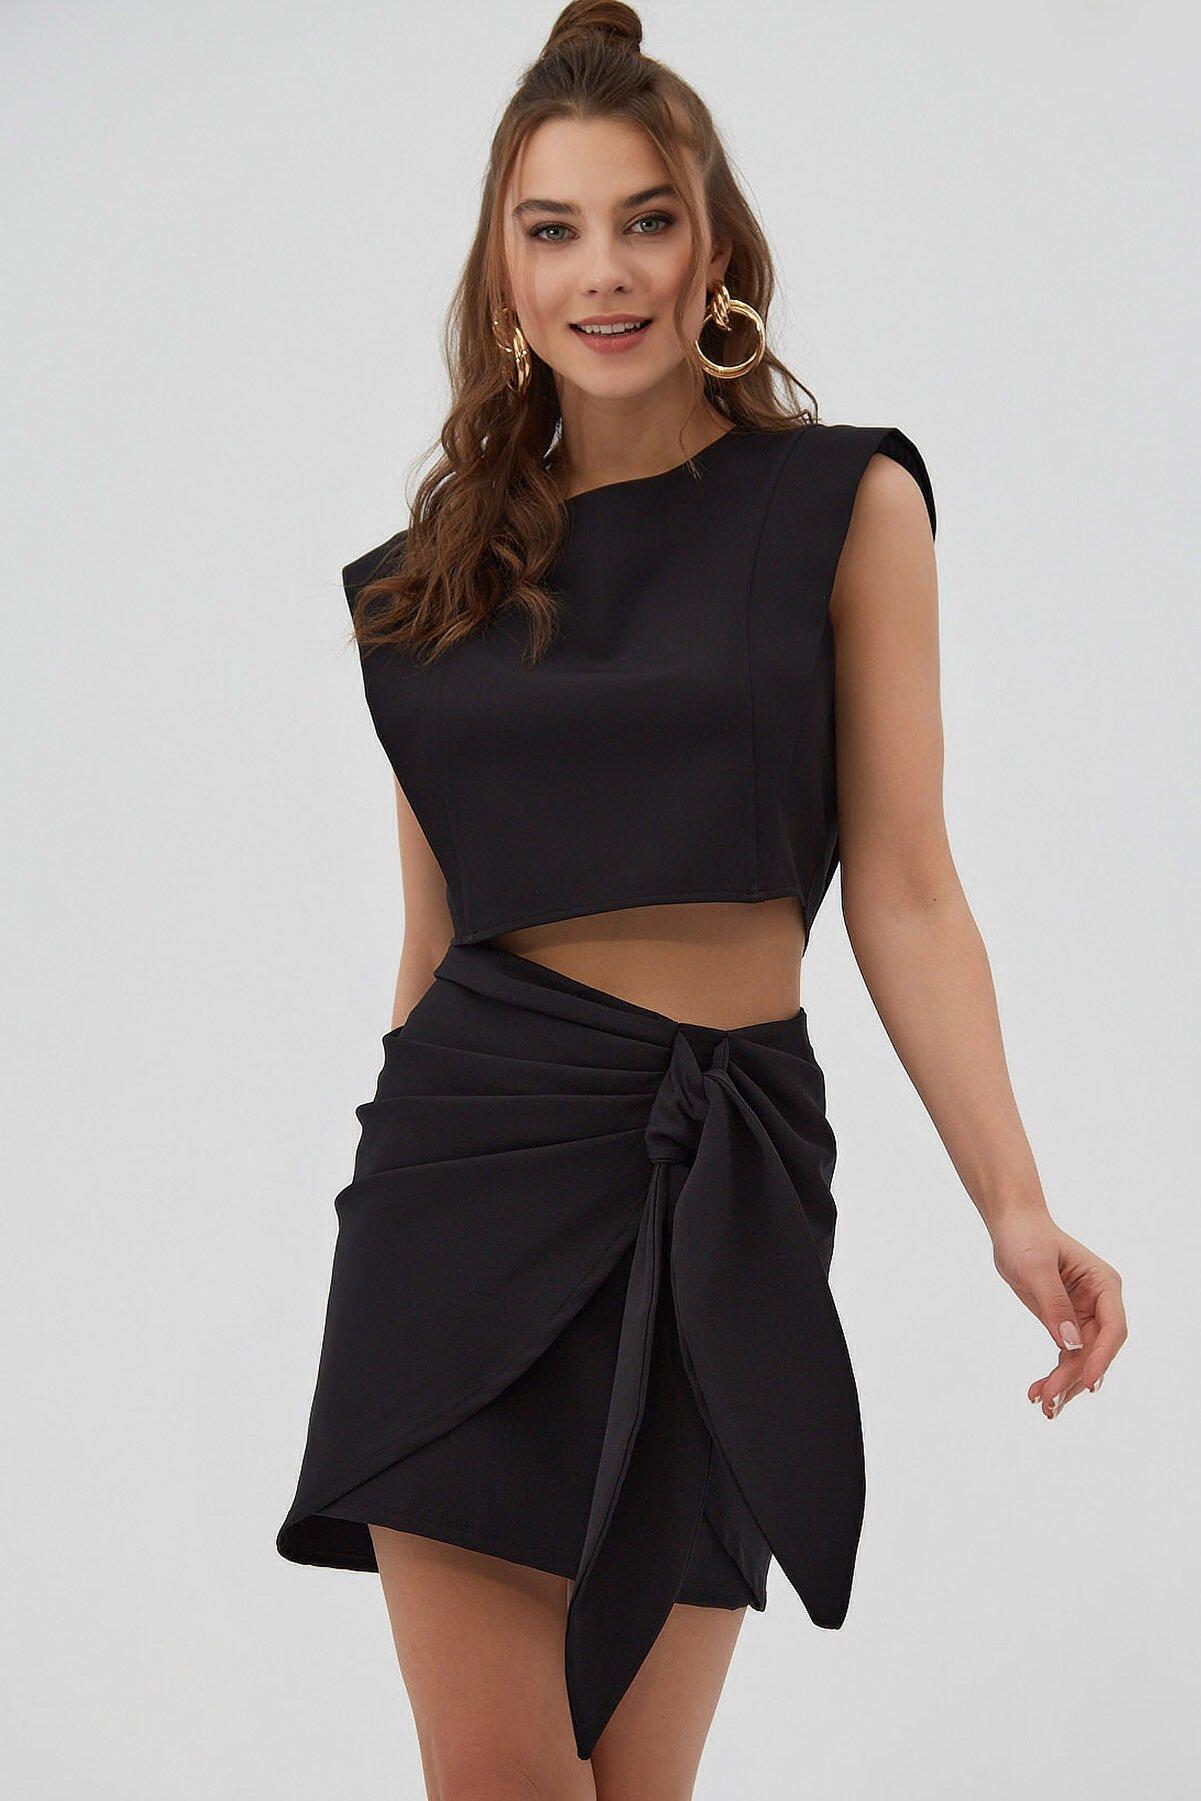 Pattaya Kadın Vatkalı Dalgıç Kumaş Crop Bluz P21s201-2161